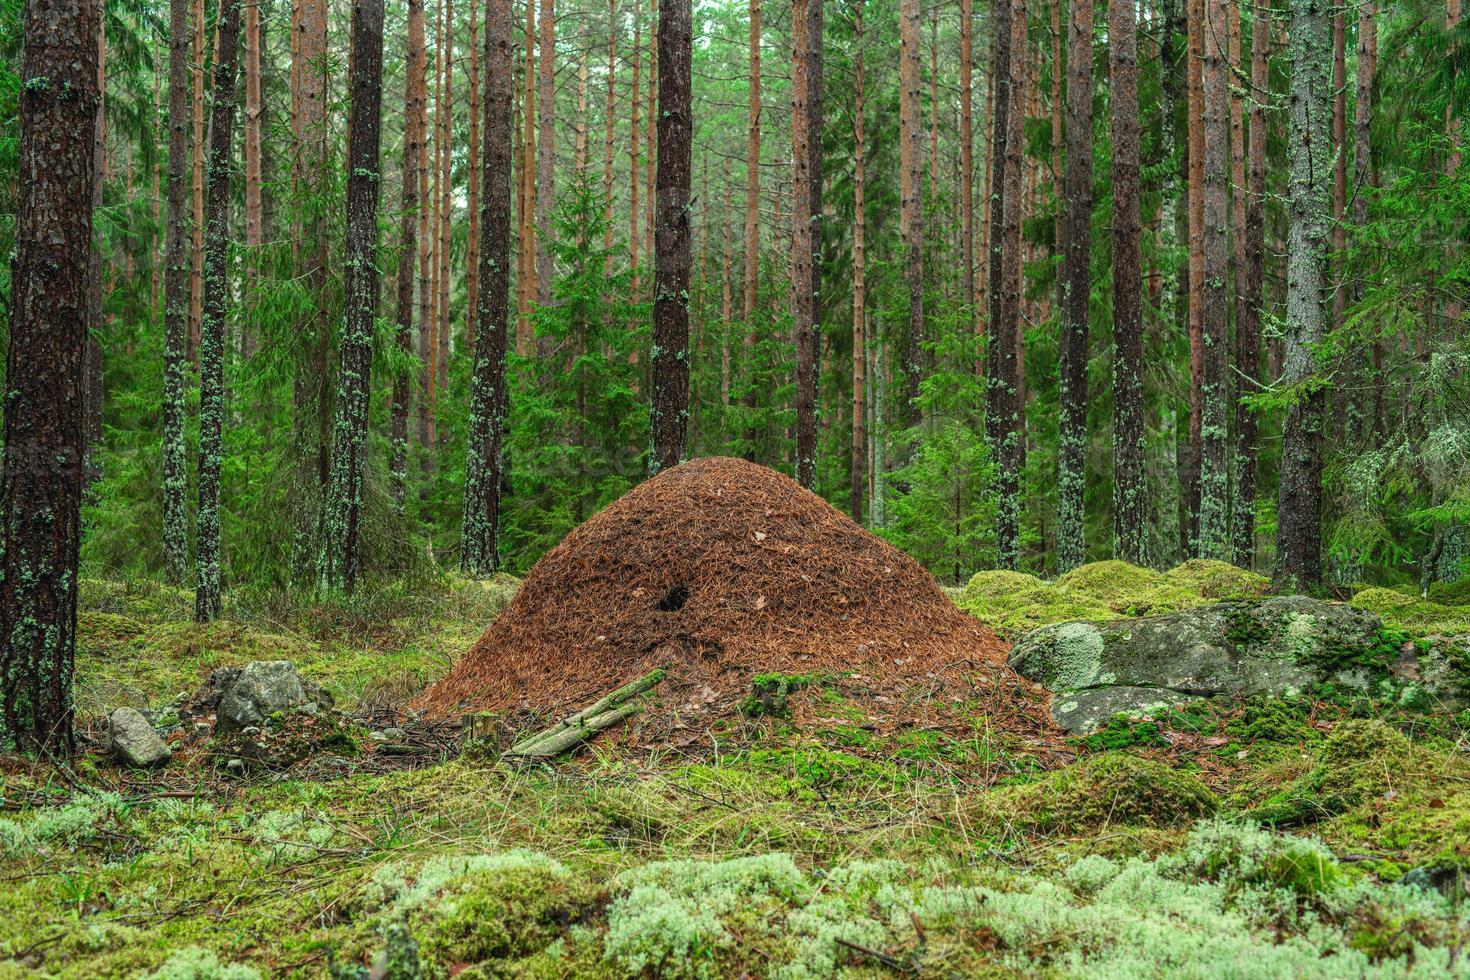 grande formicaio in una foresta foto